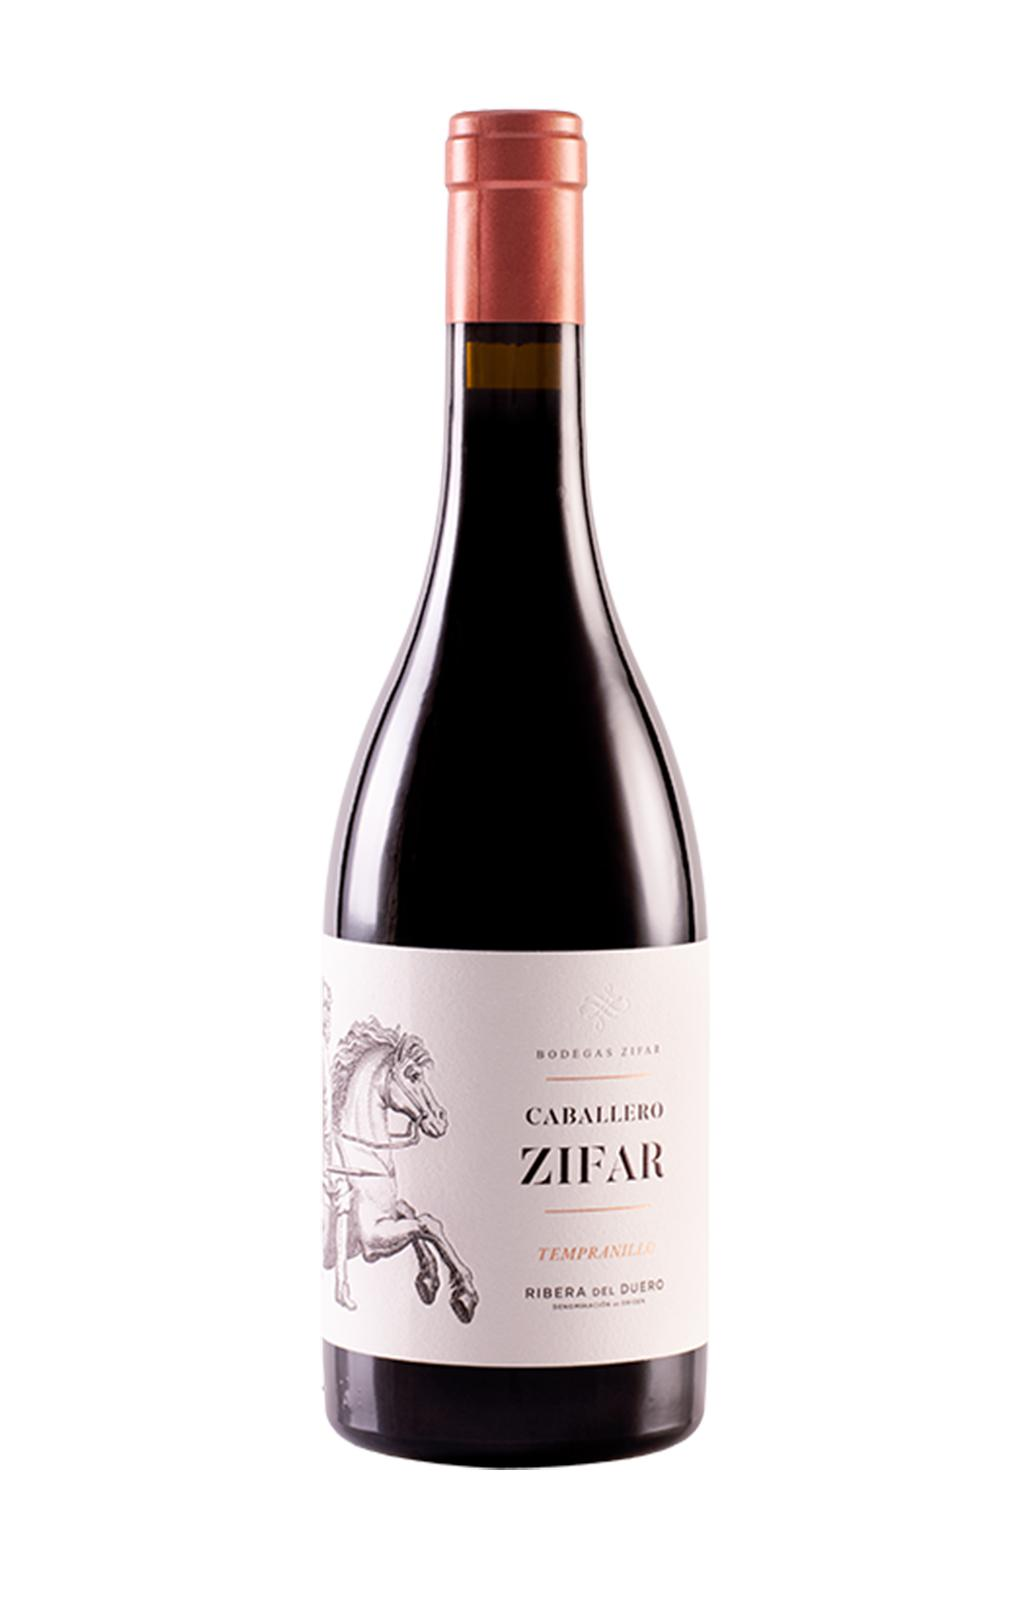 Caballero Zifar 2015